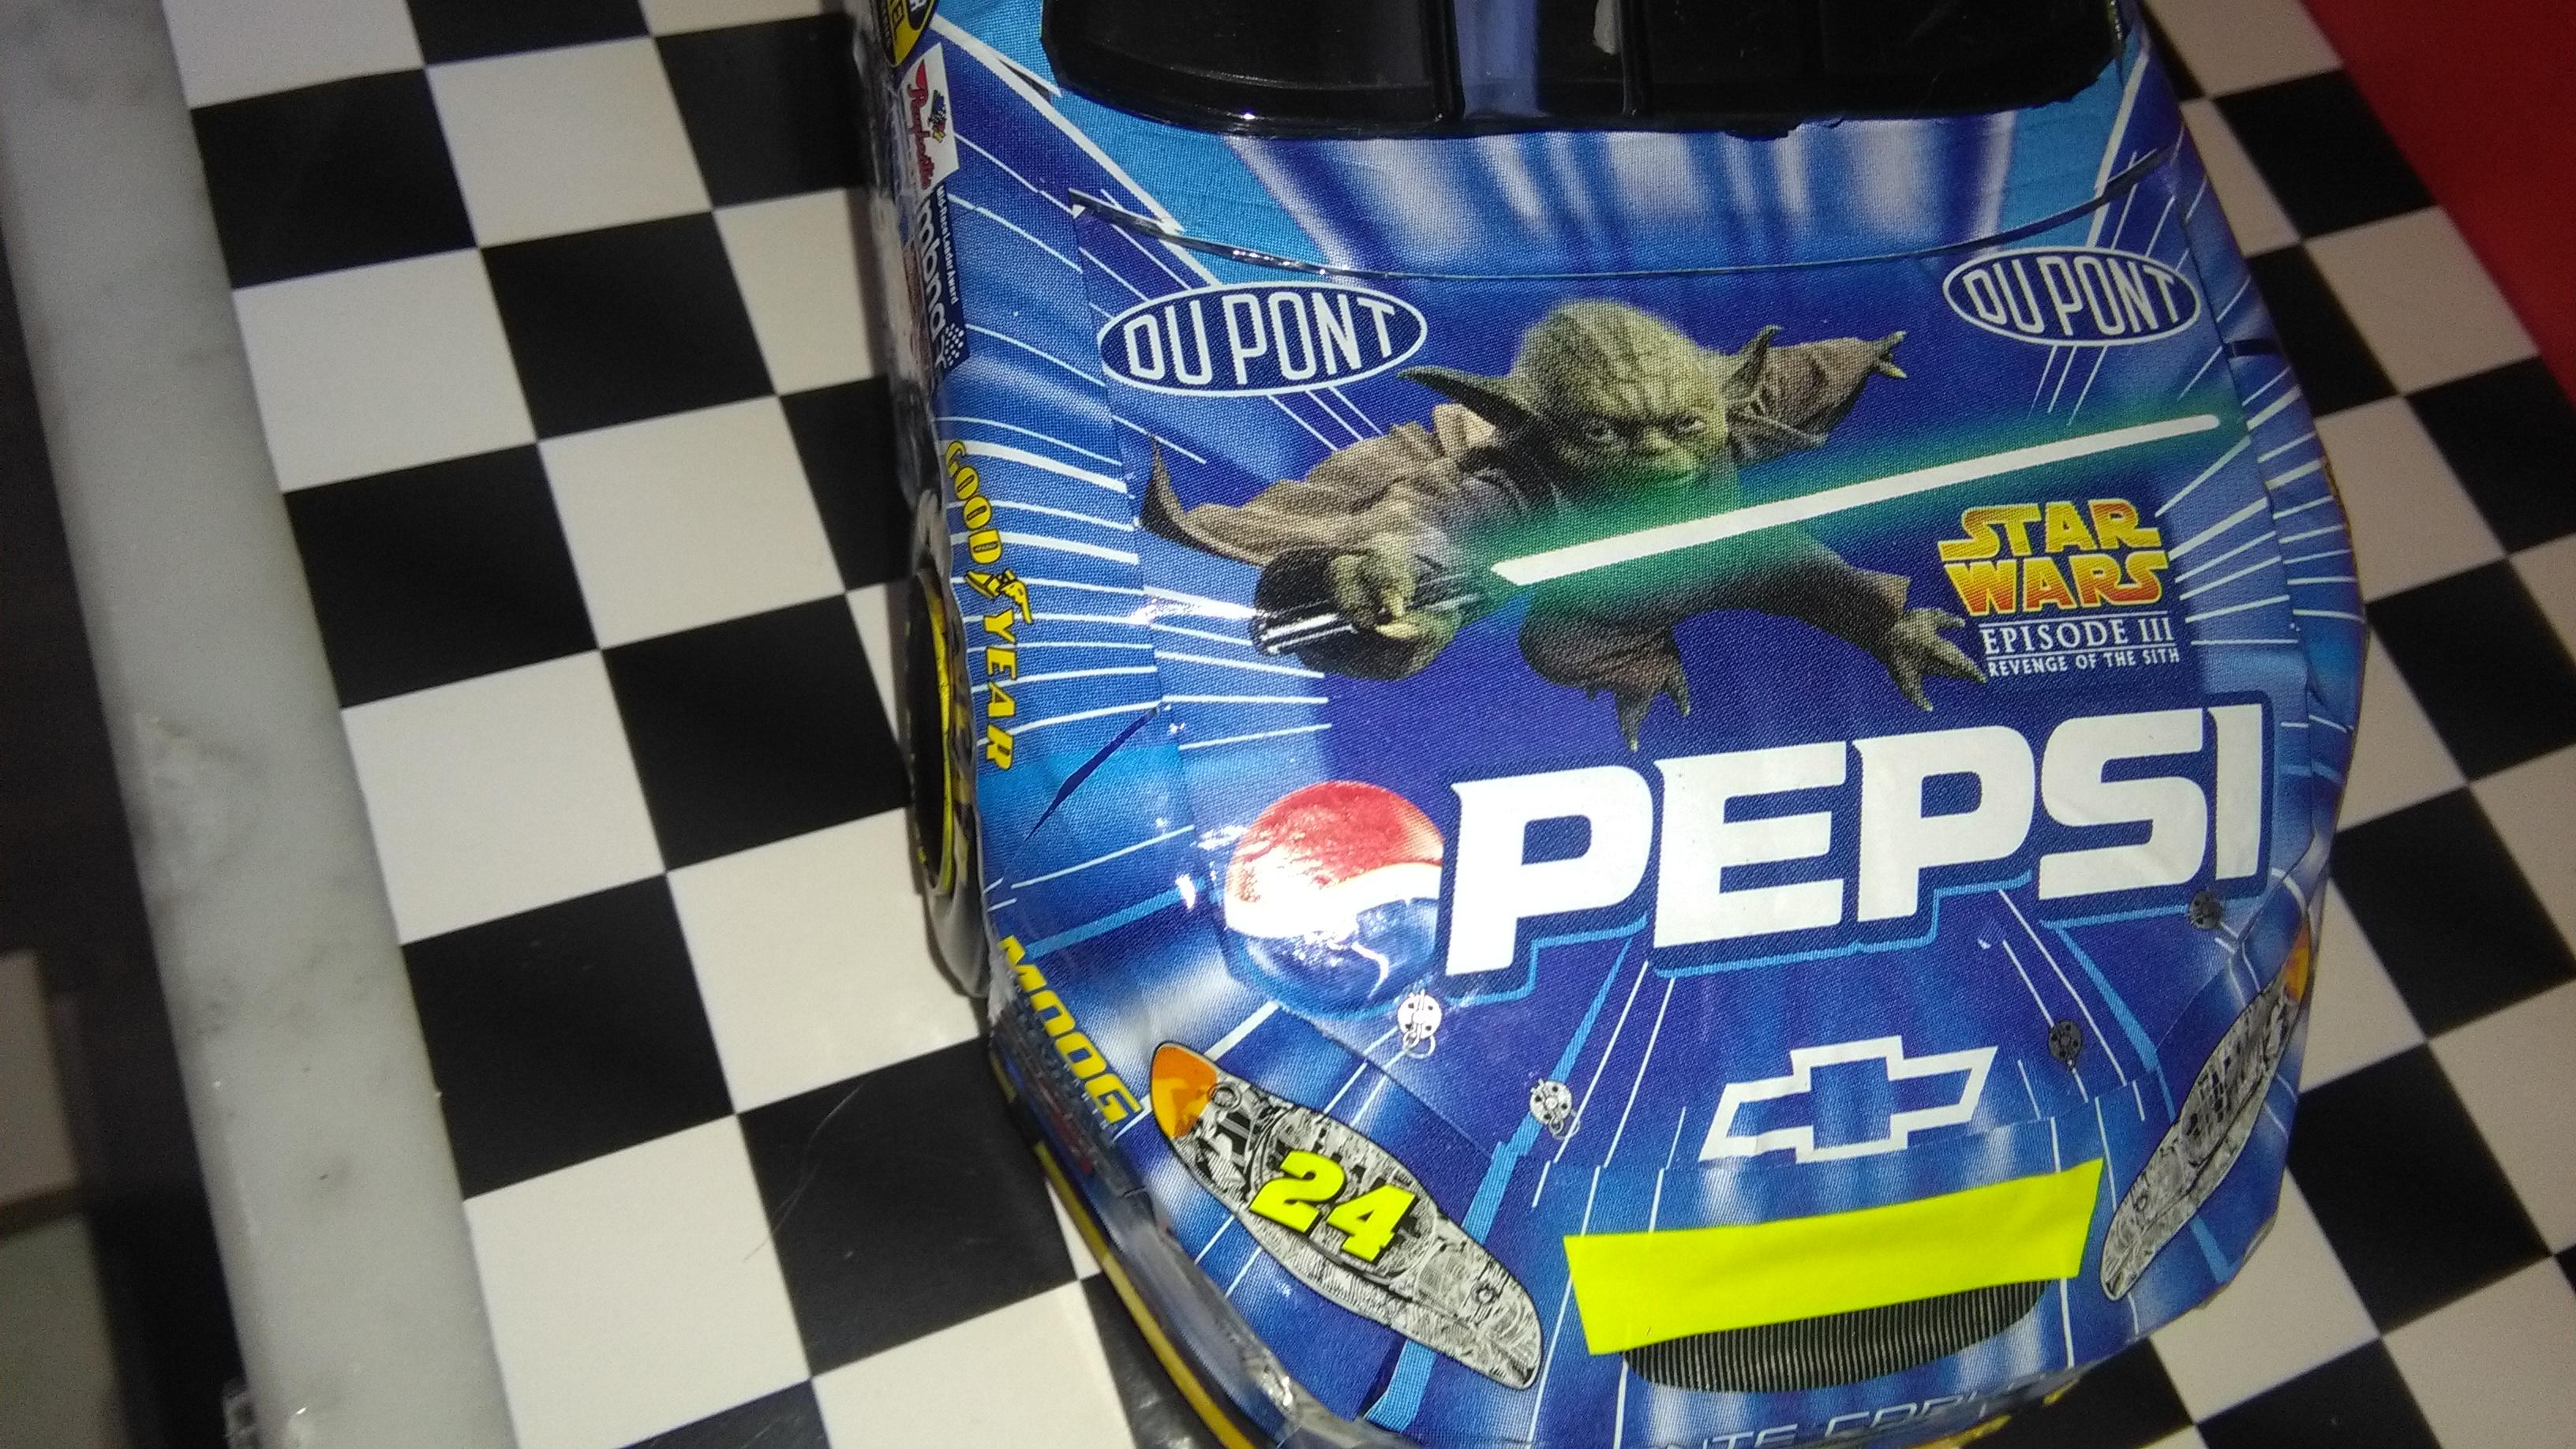 Chevy Monte-Carlo 2005 #24 Jeff Gordon Pepsi/Star Wars  600283IMG20170430170126